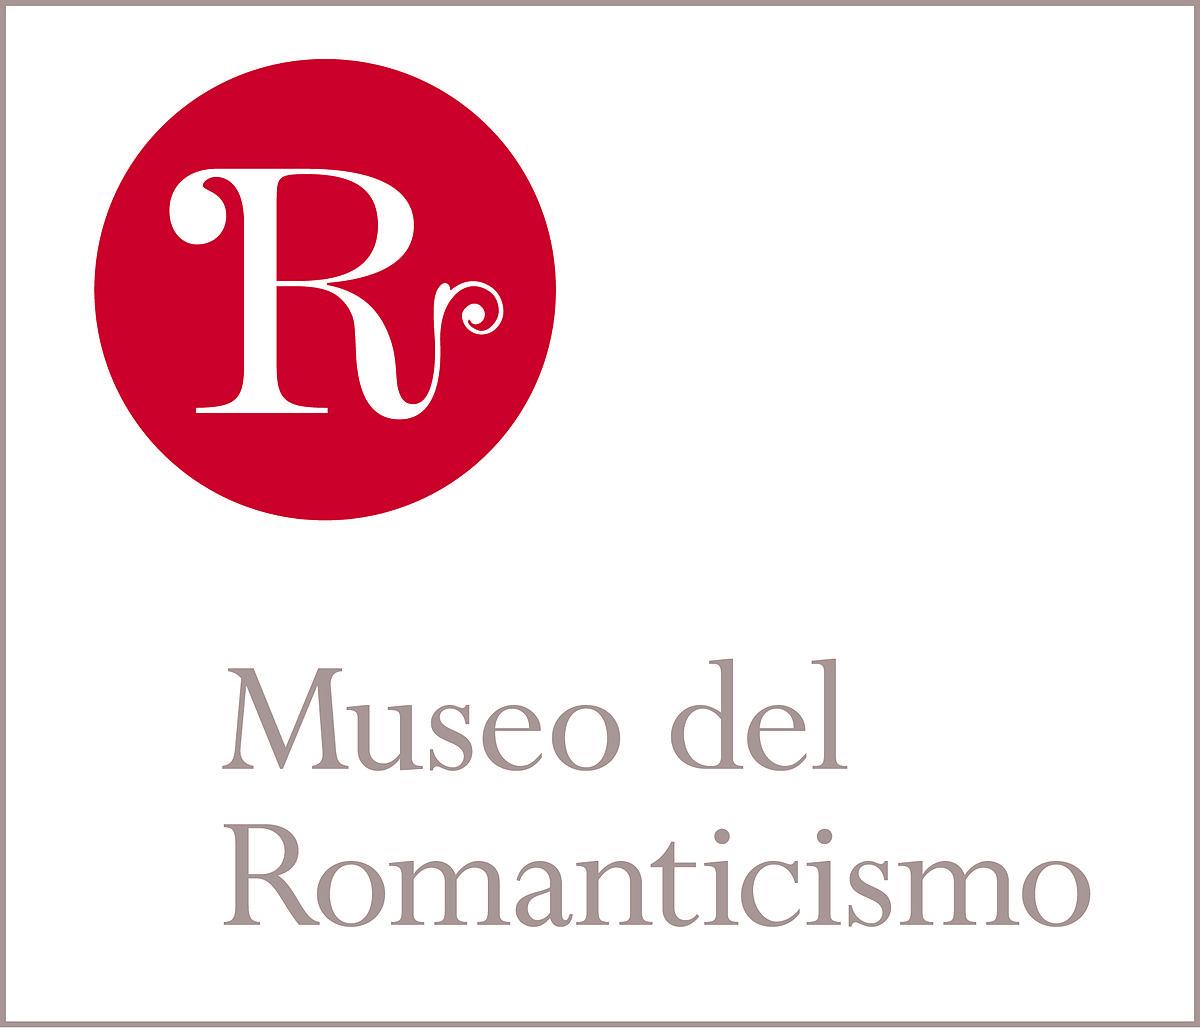 10 Características del Romanticismo  Caracteristicasco